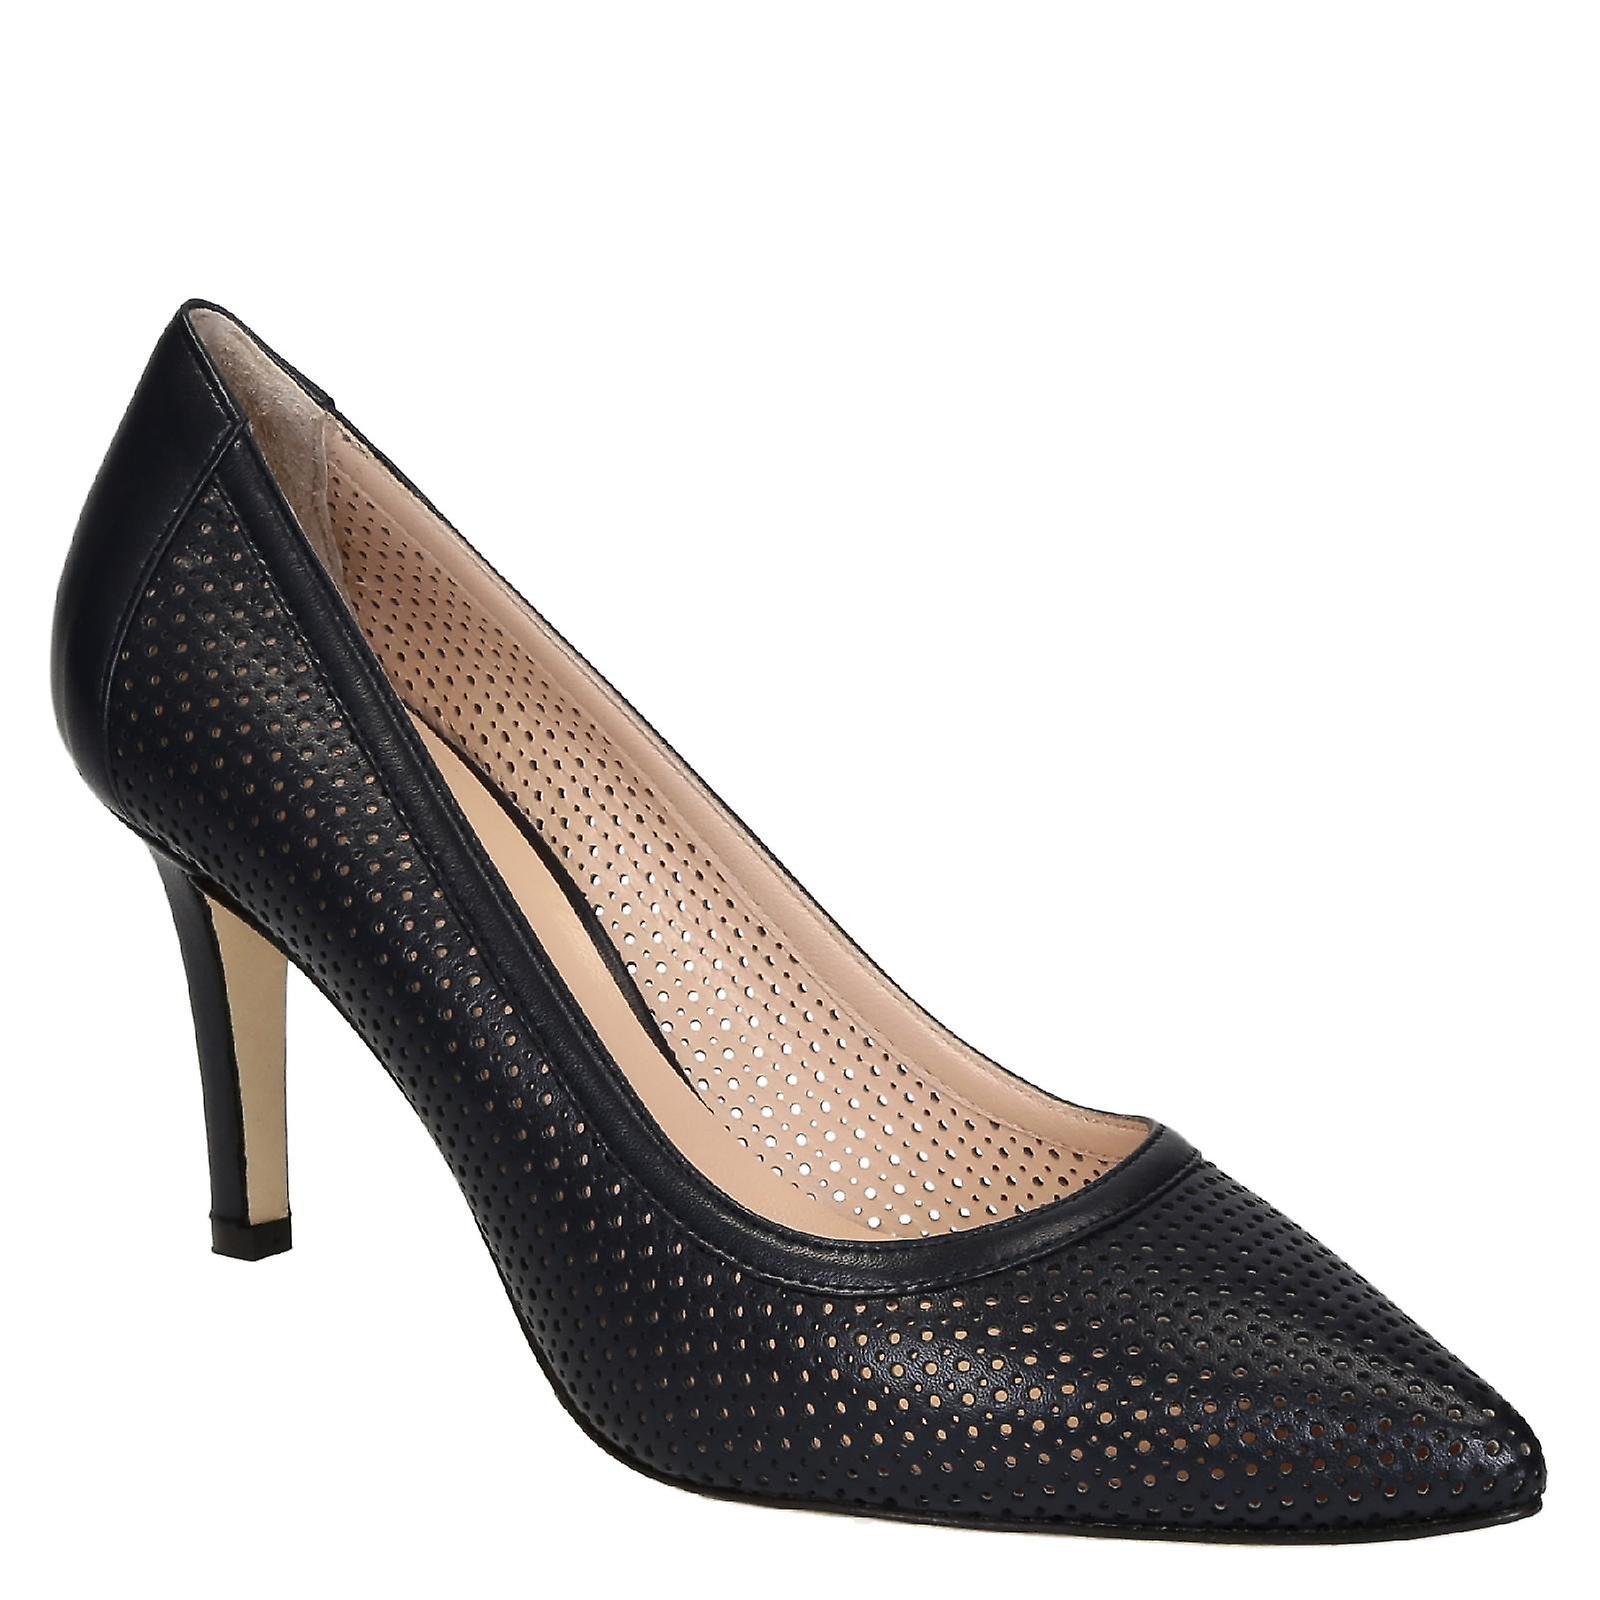 Leonardo Shoes Women's blue openwork calf leather pumps with stiletto heels pMbN5